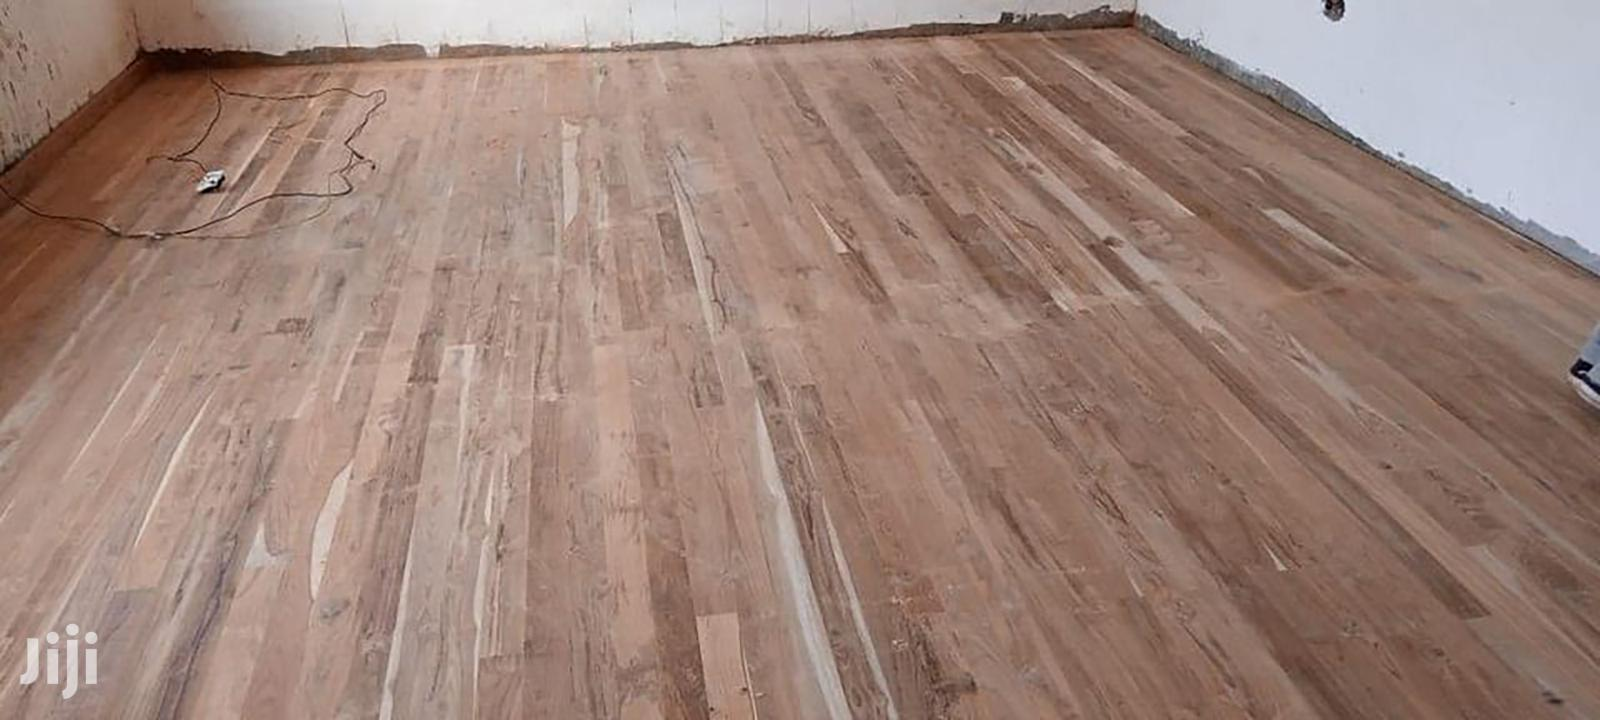 Wooden Floor in Kenya Mahogany Quality